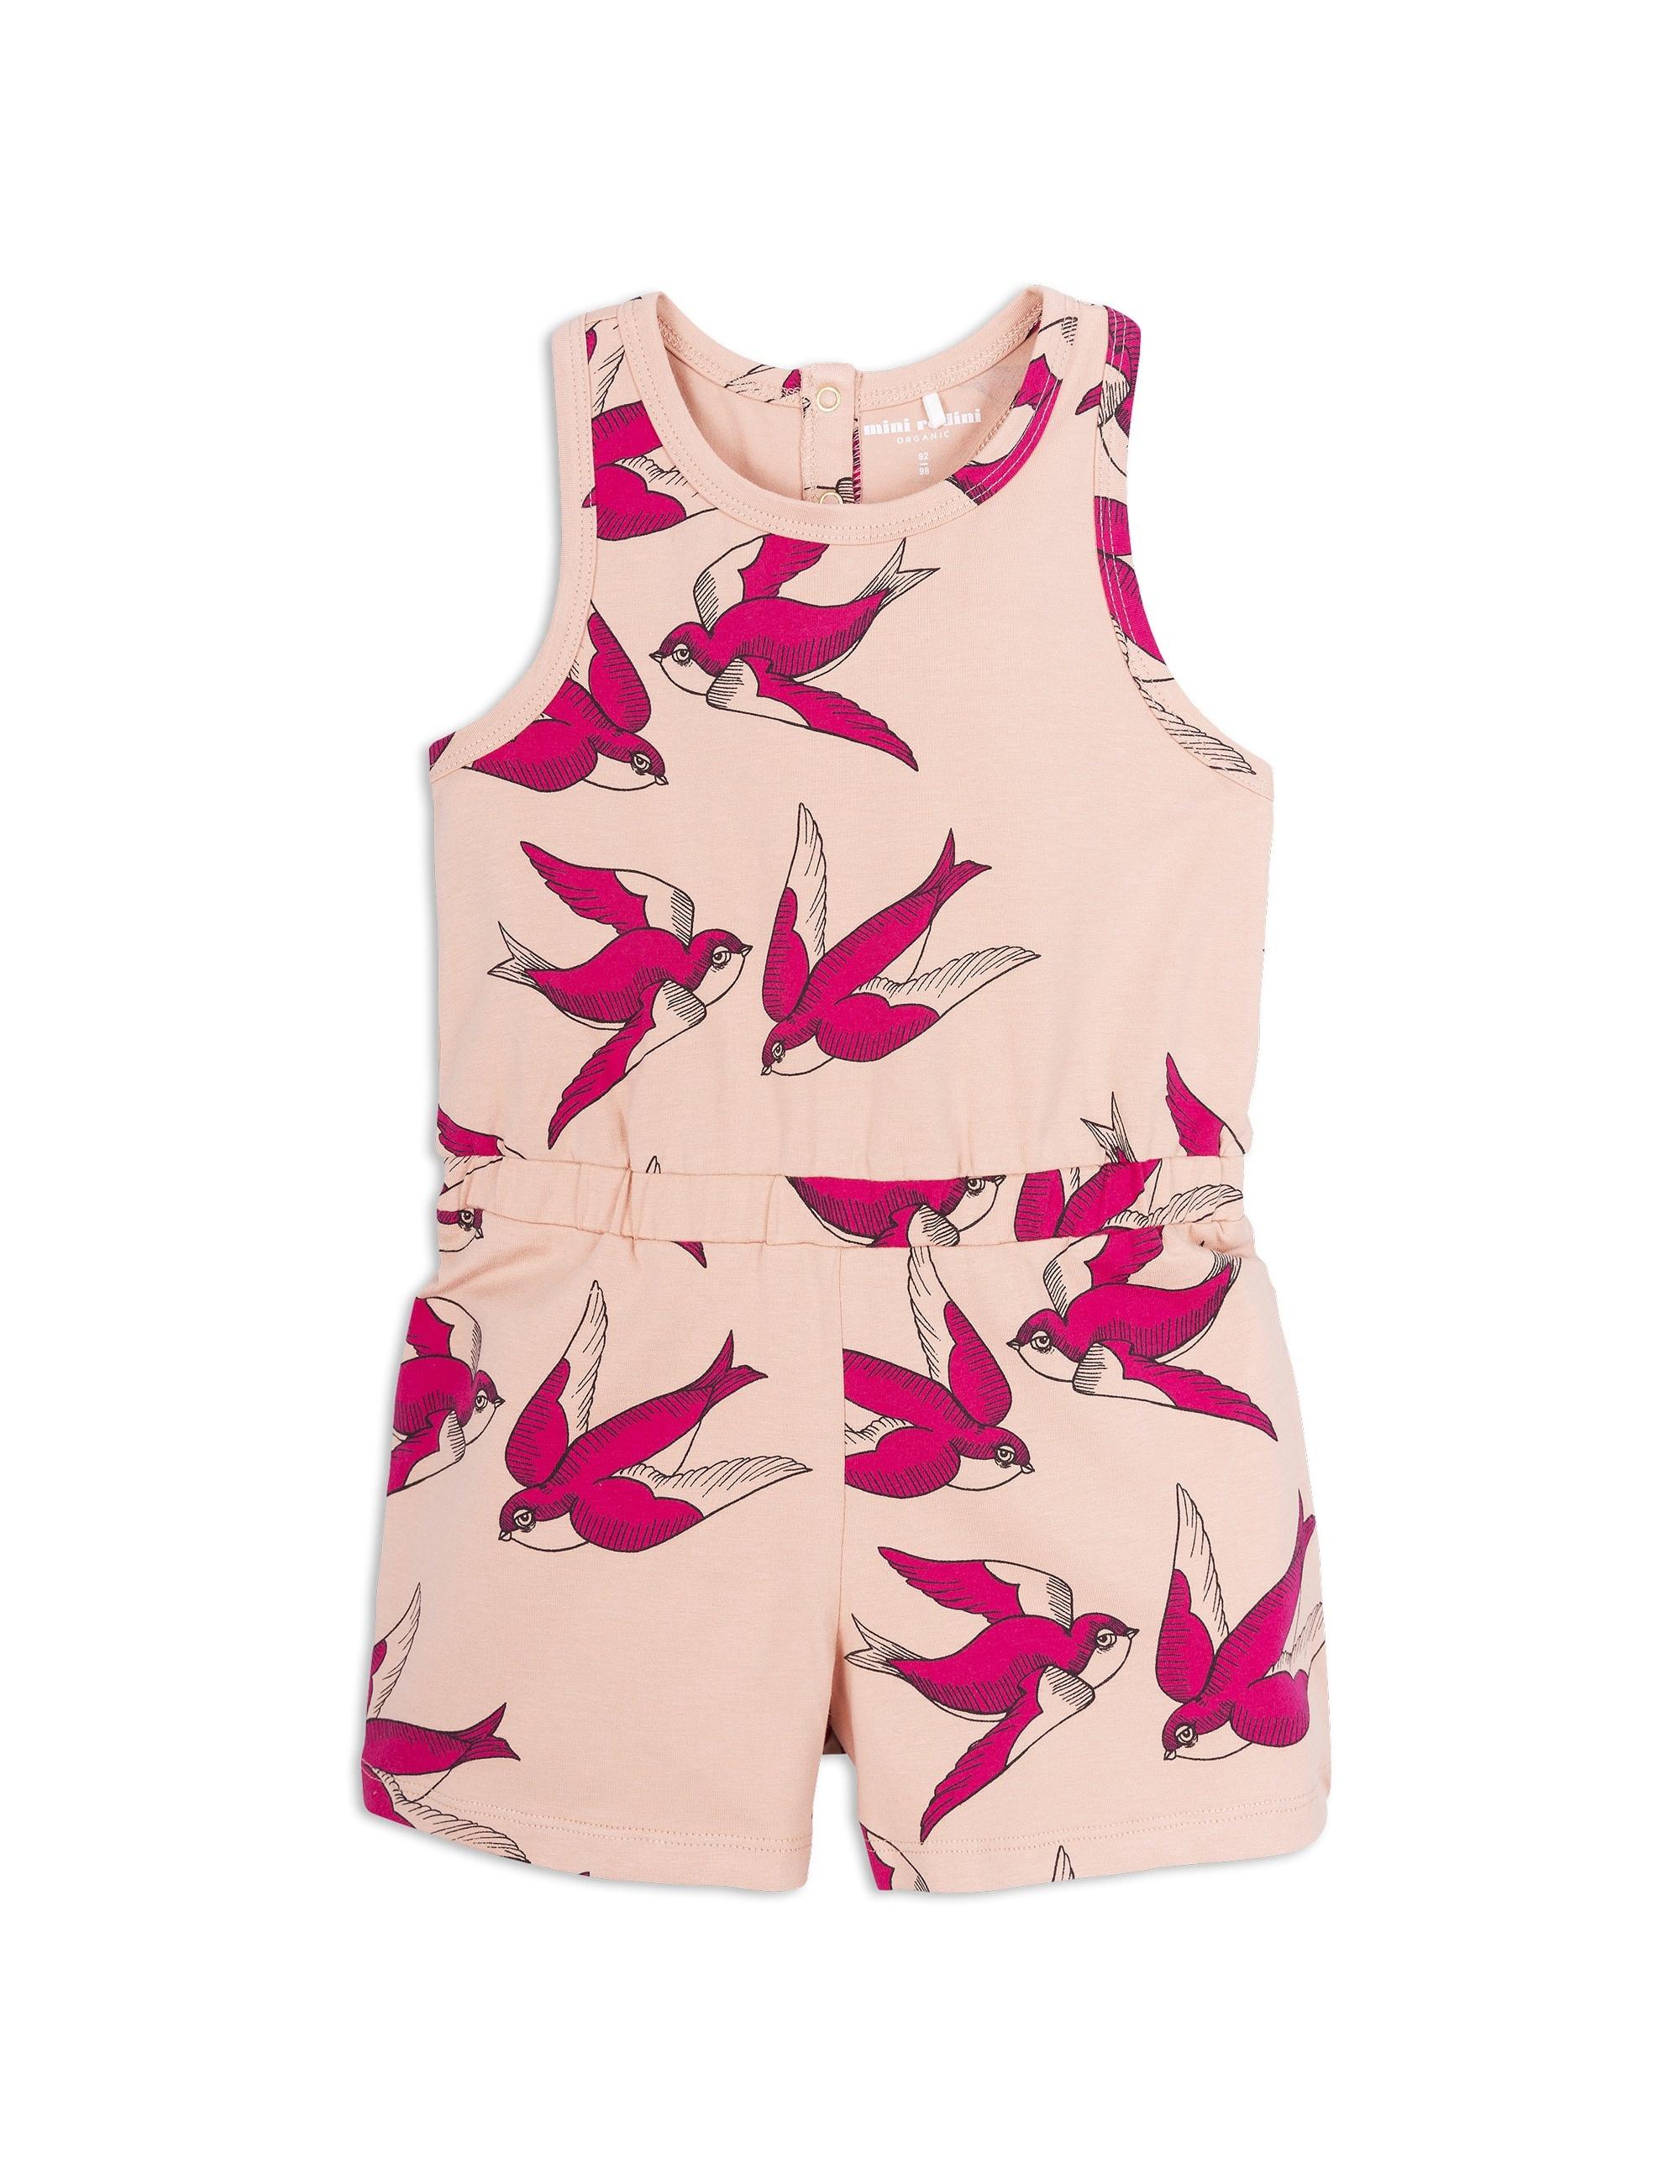 1825014133 1 mini rodini swallows summersuit pink